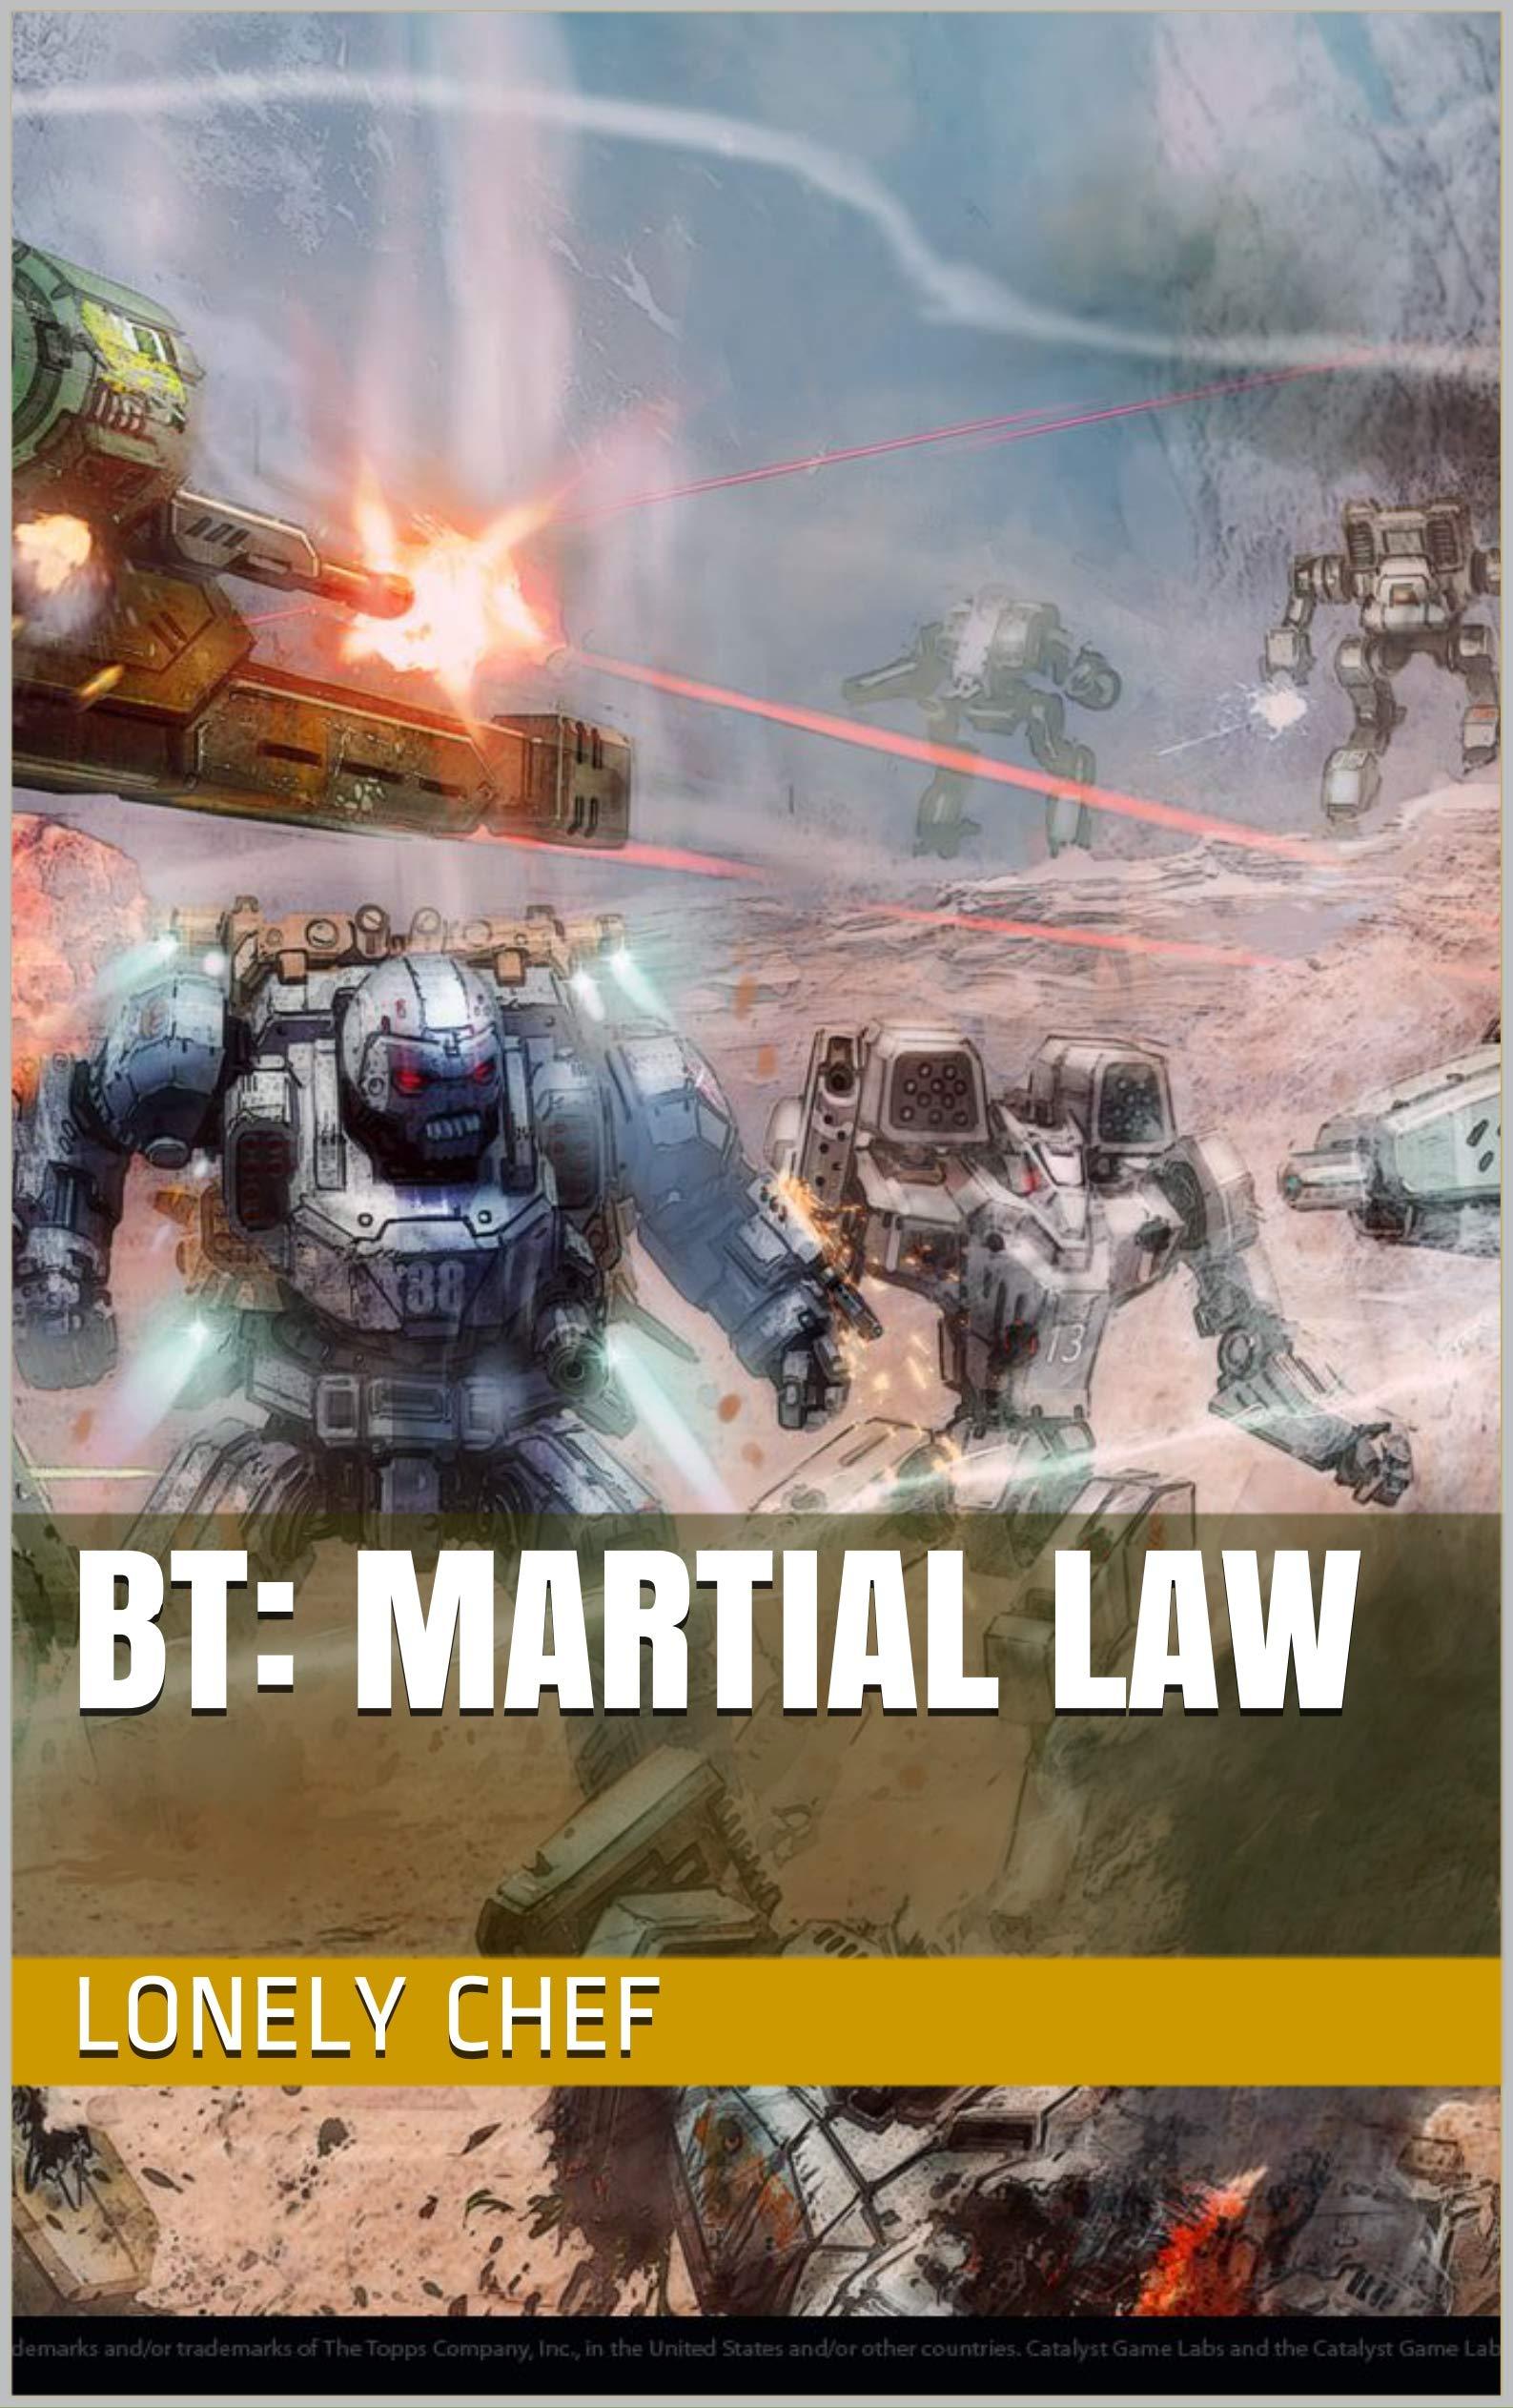 BT: Martial Law